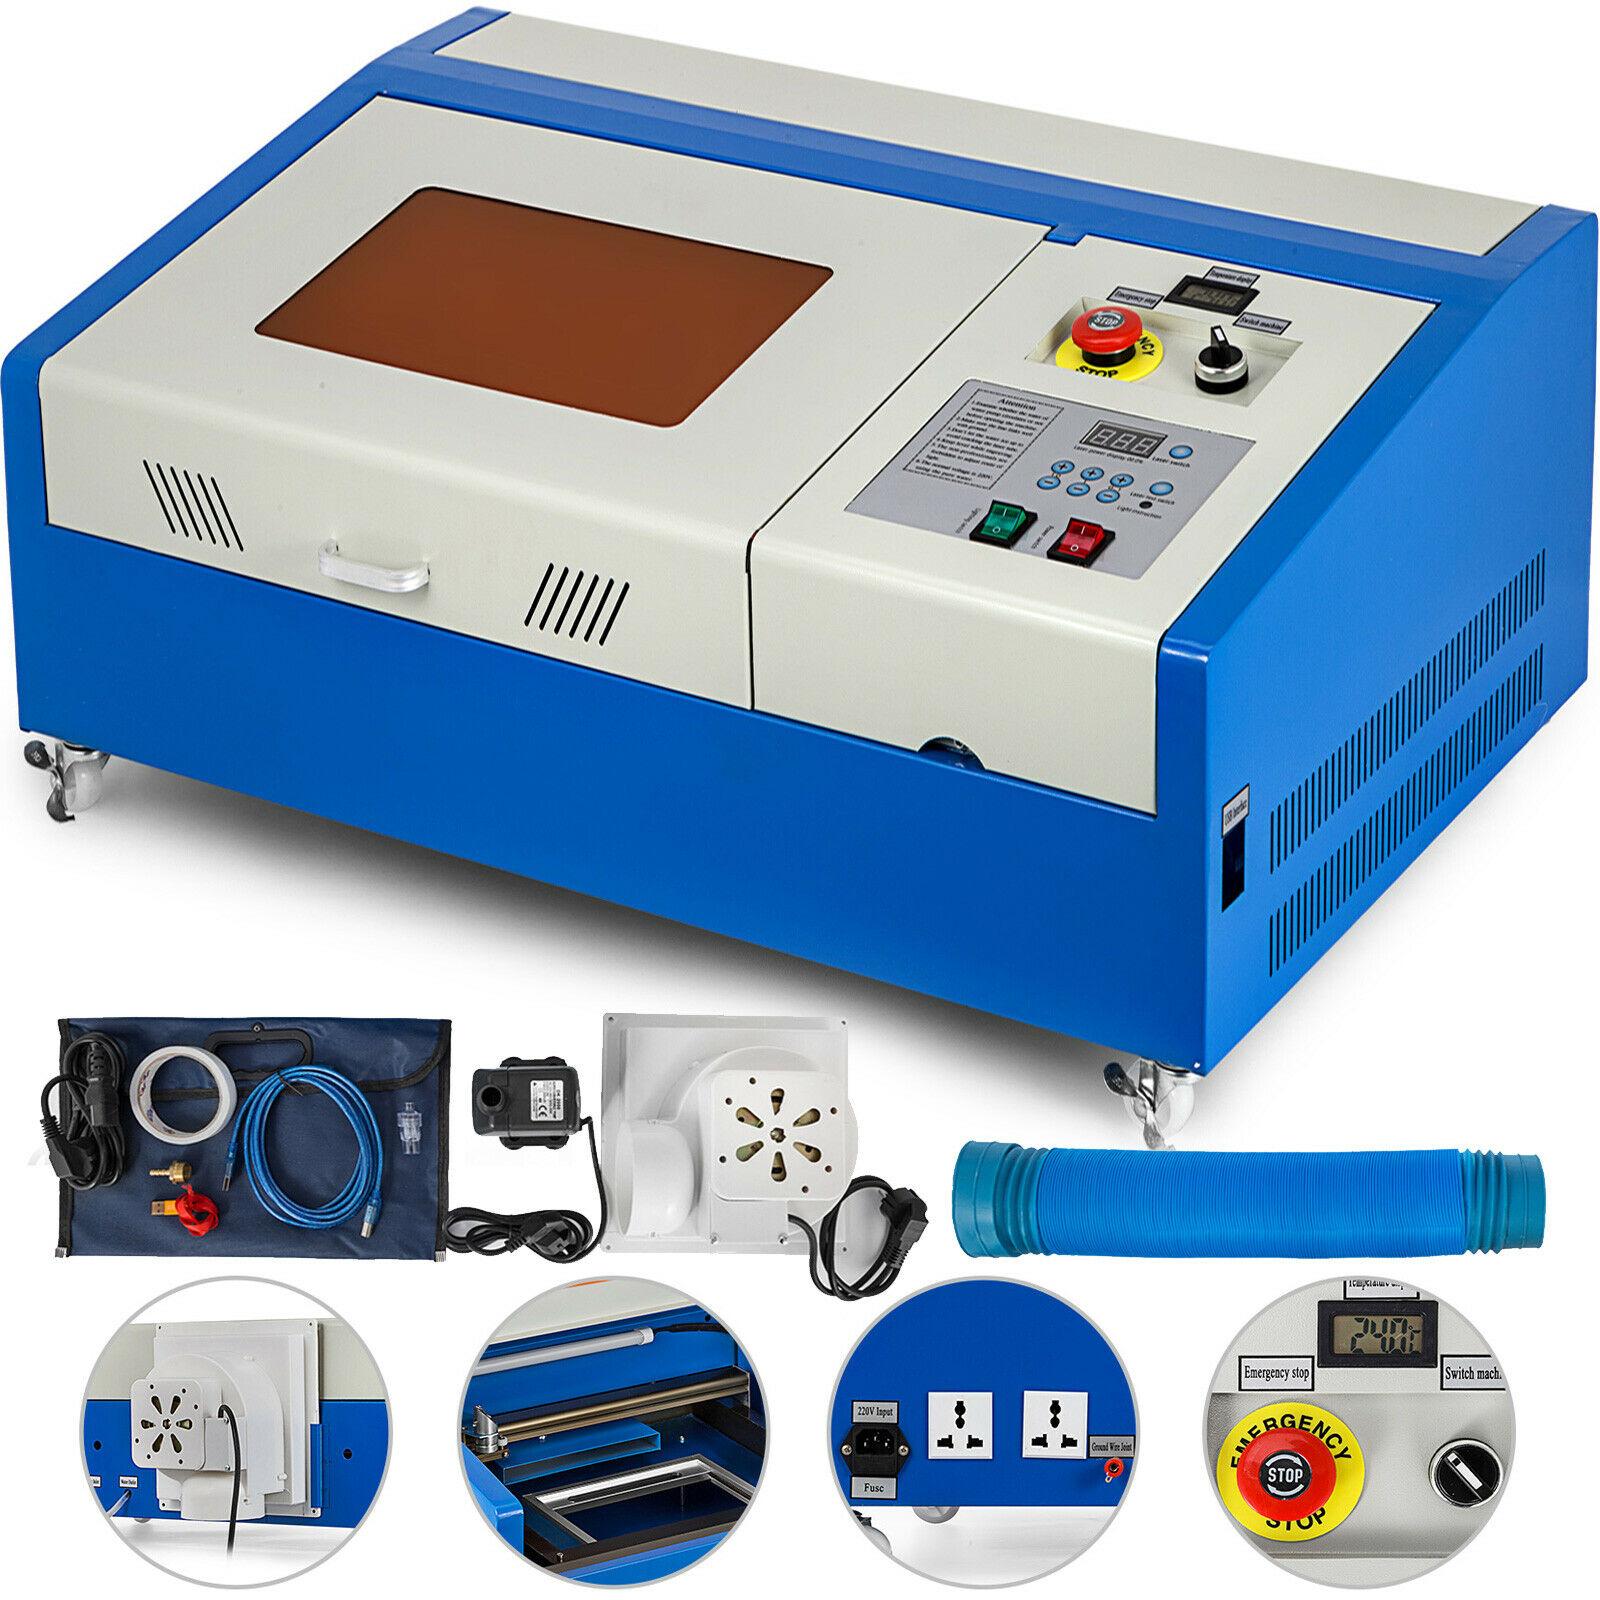 CO2 Laser Engraver Machine 40W Engraver Cutter Engraving Machine